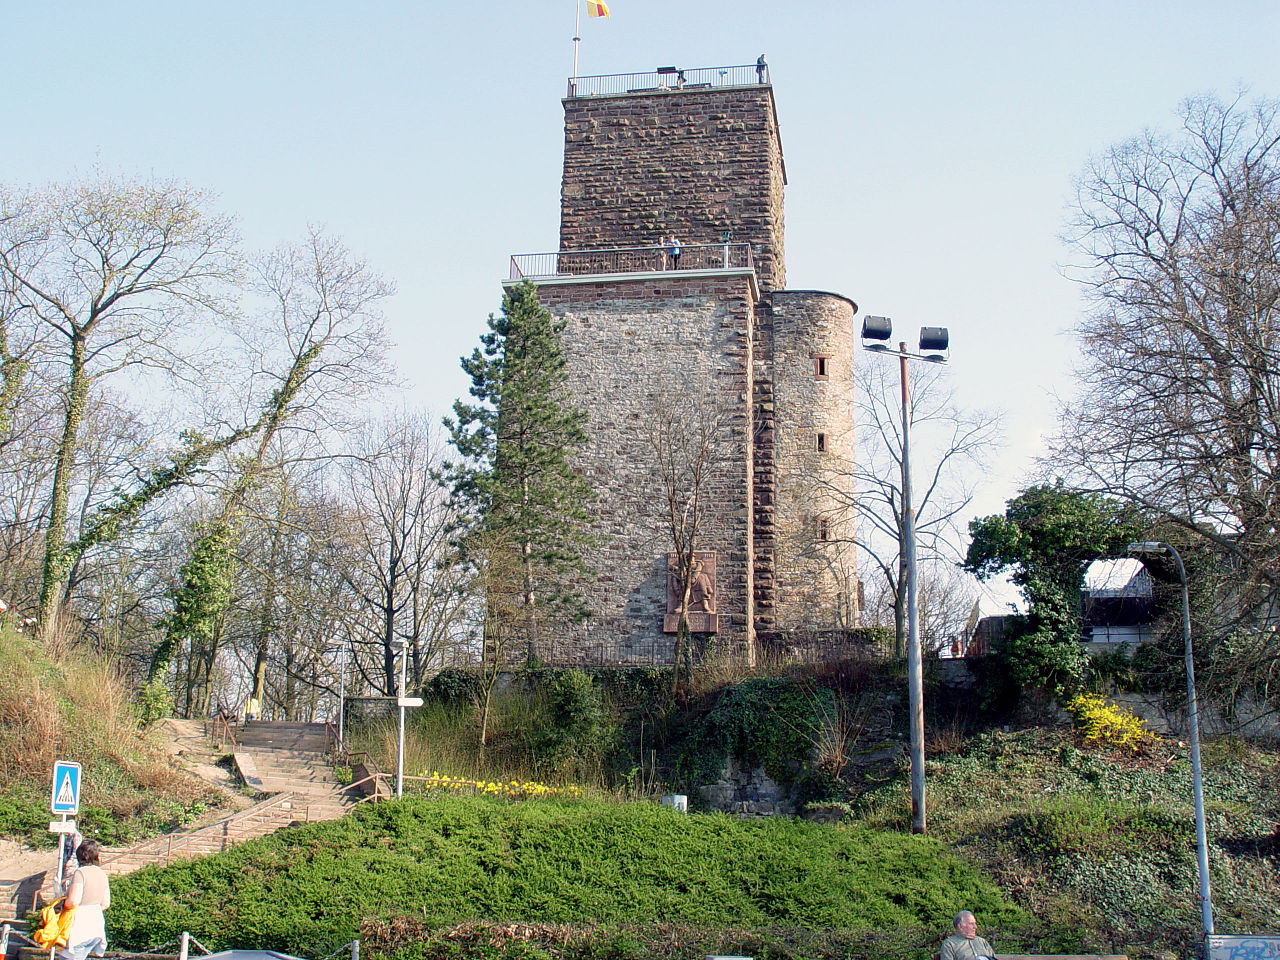 Bild Anders auf dem Turmberg